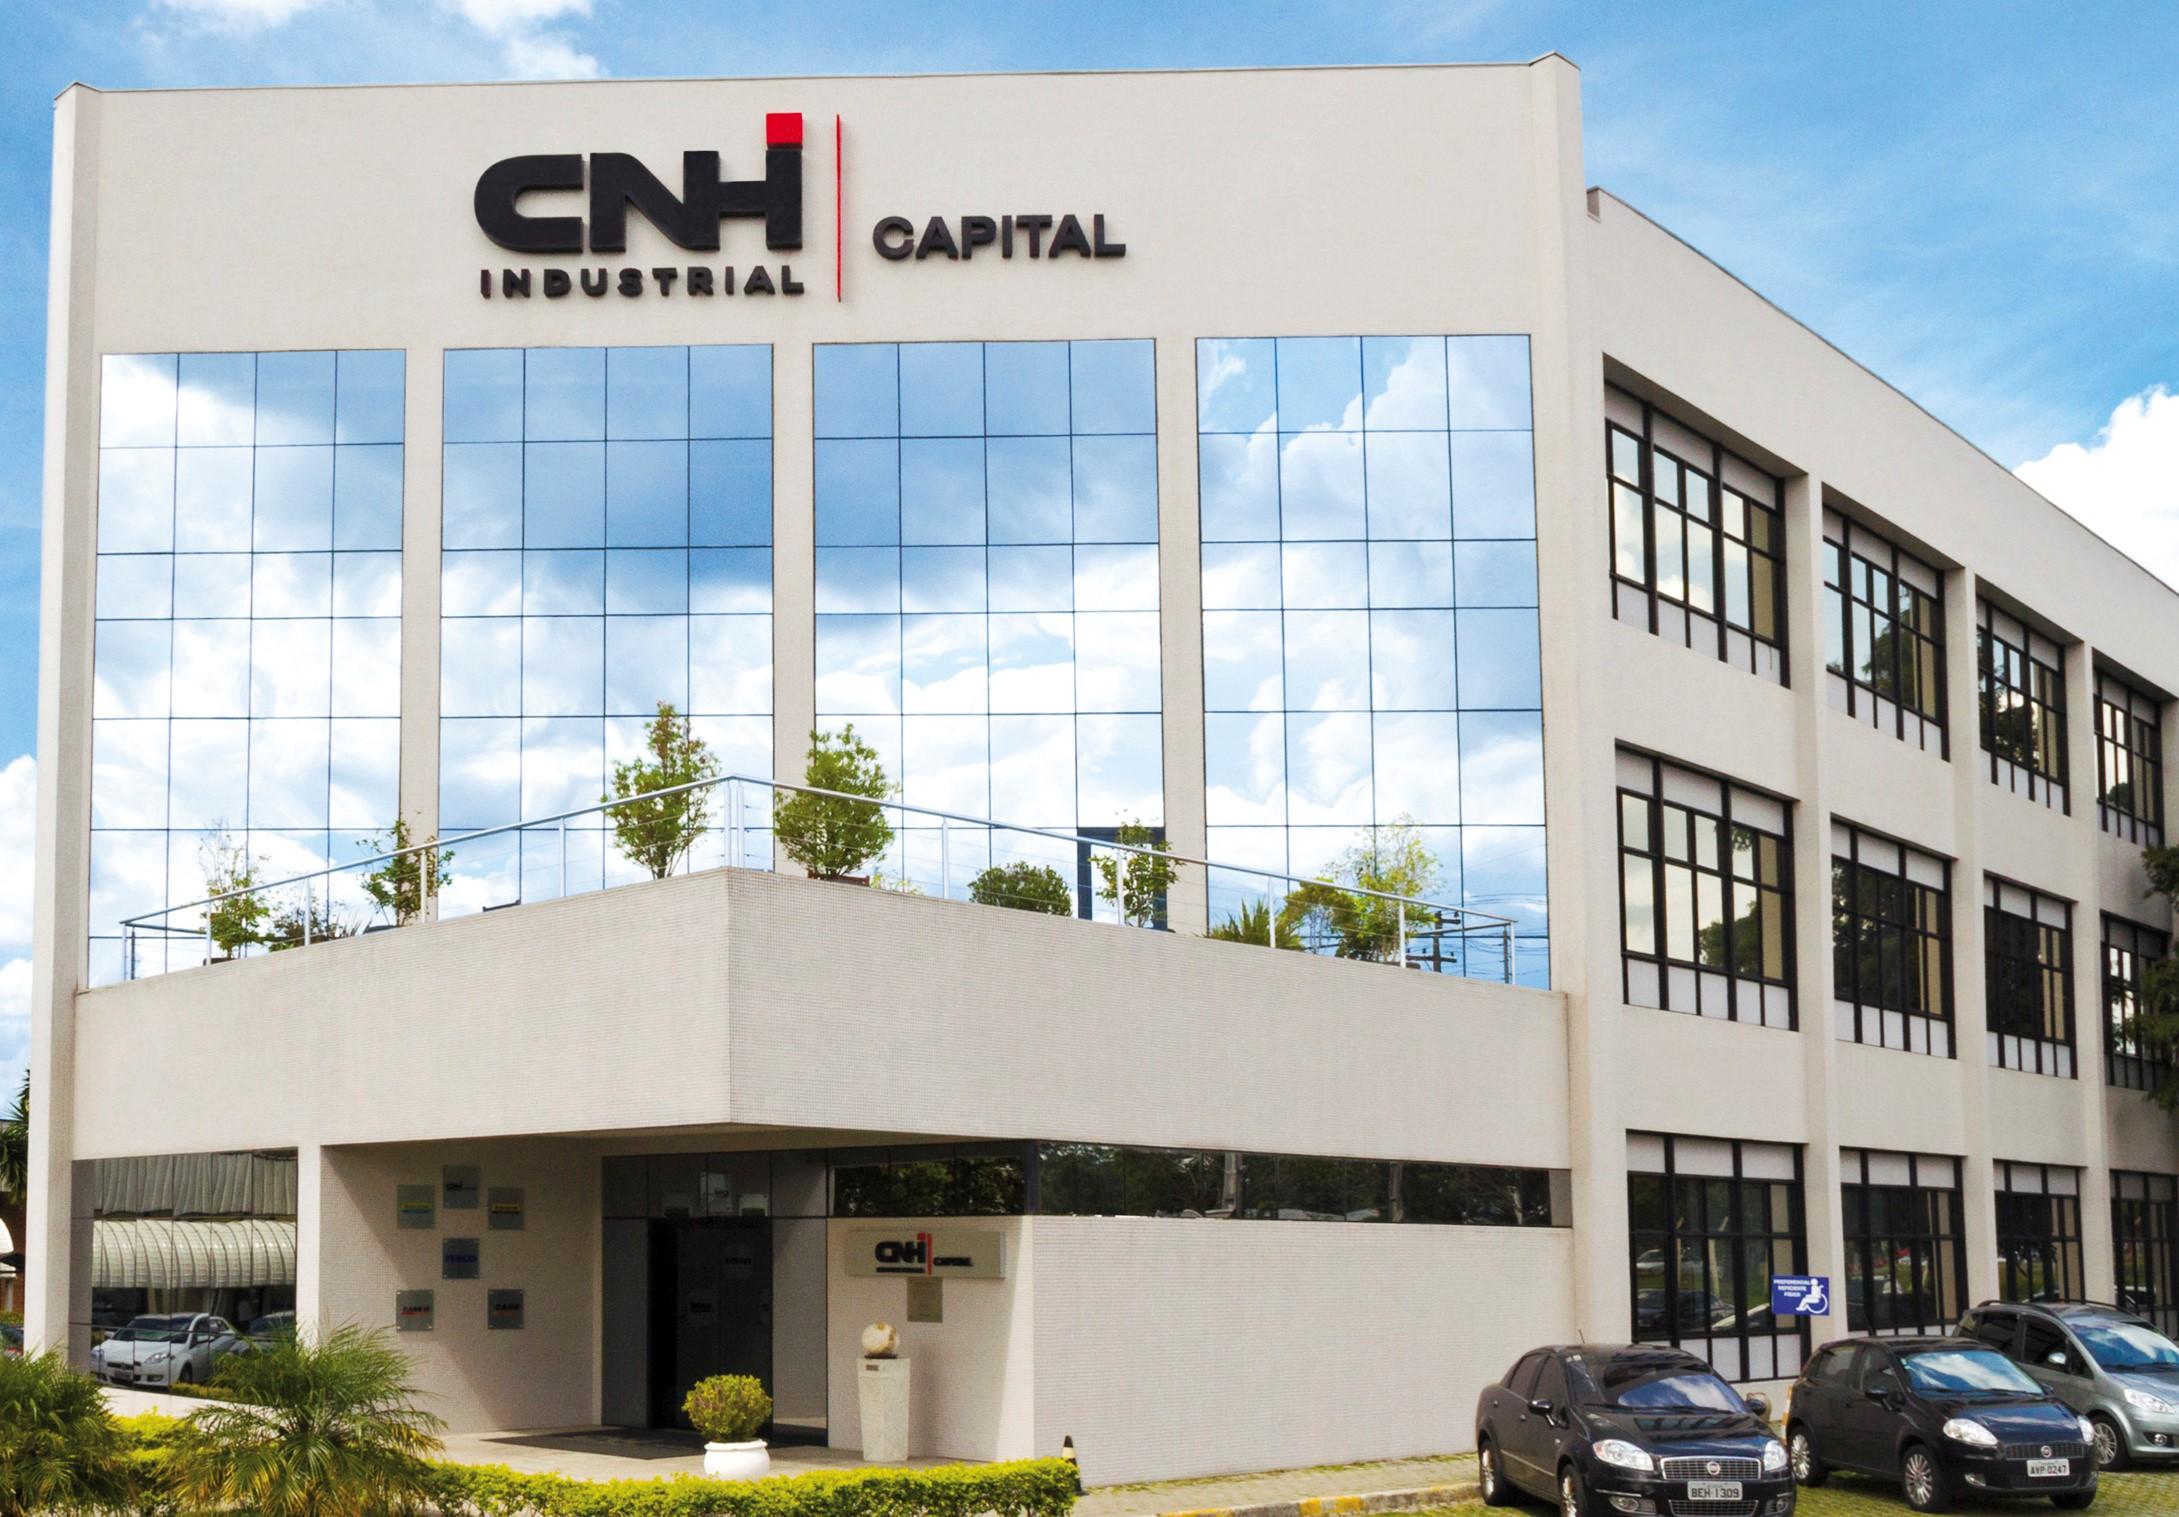 Sede Banco CNH Industrial, em Curitiba